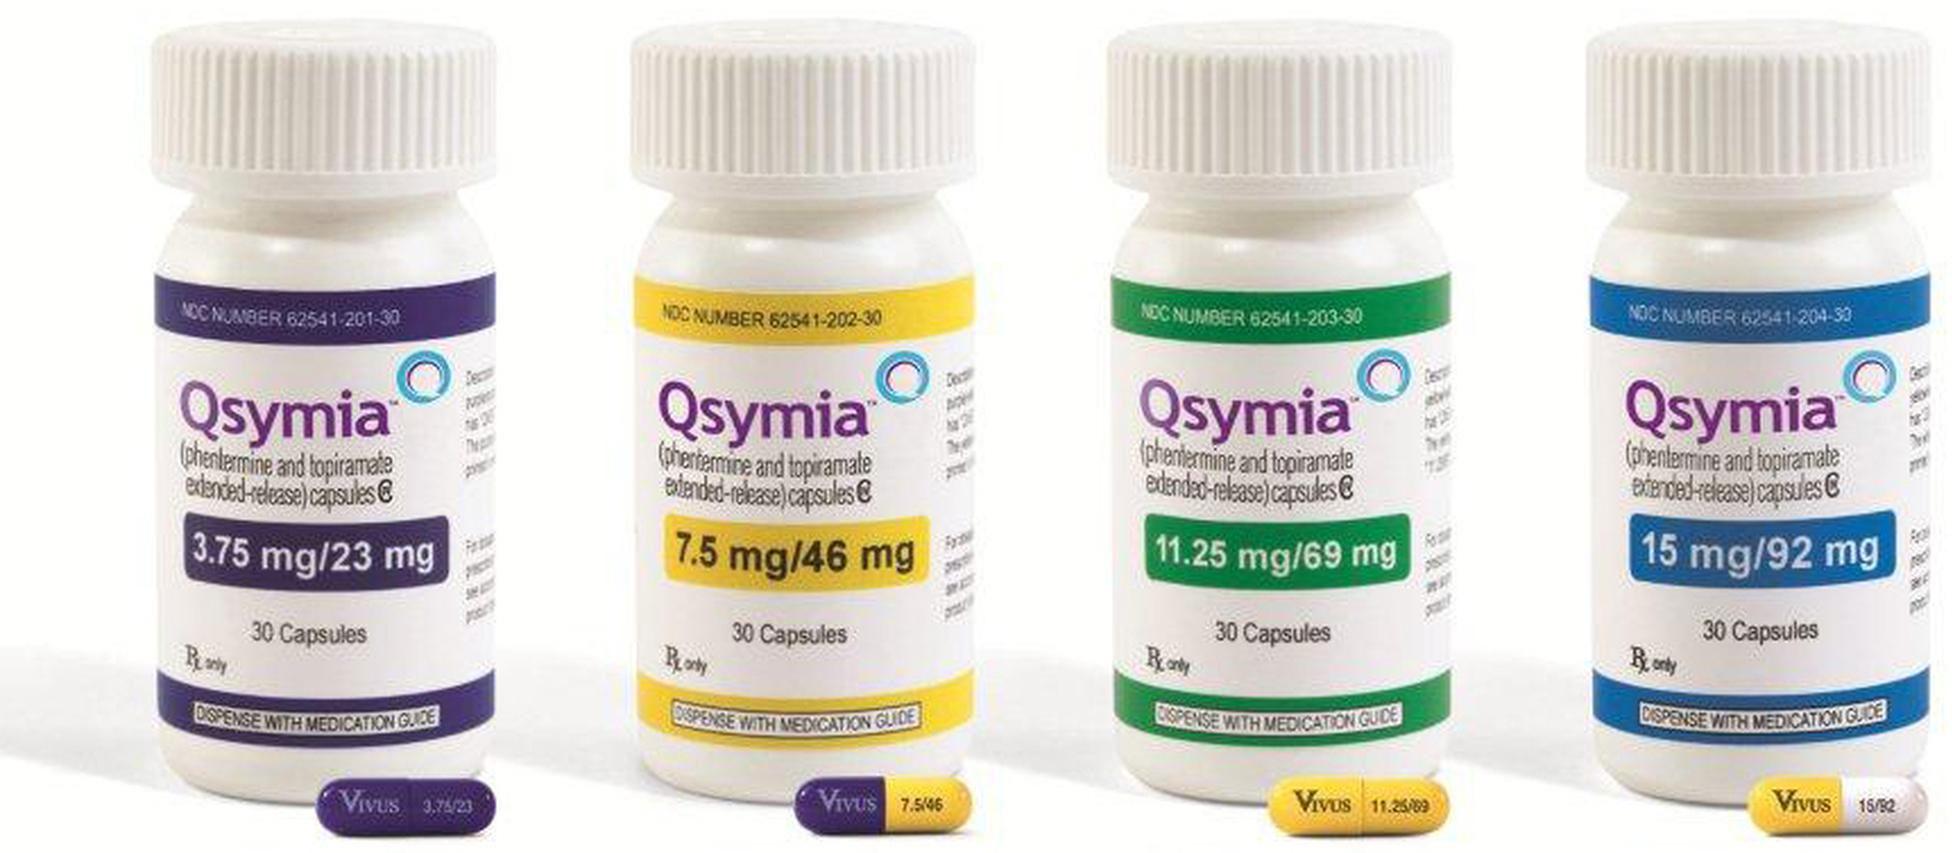 qsymia - Великая проблема ожирения